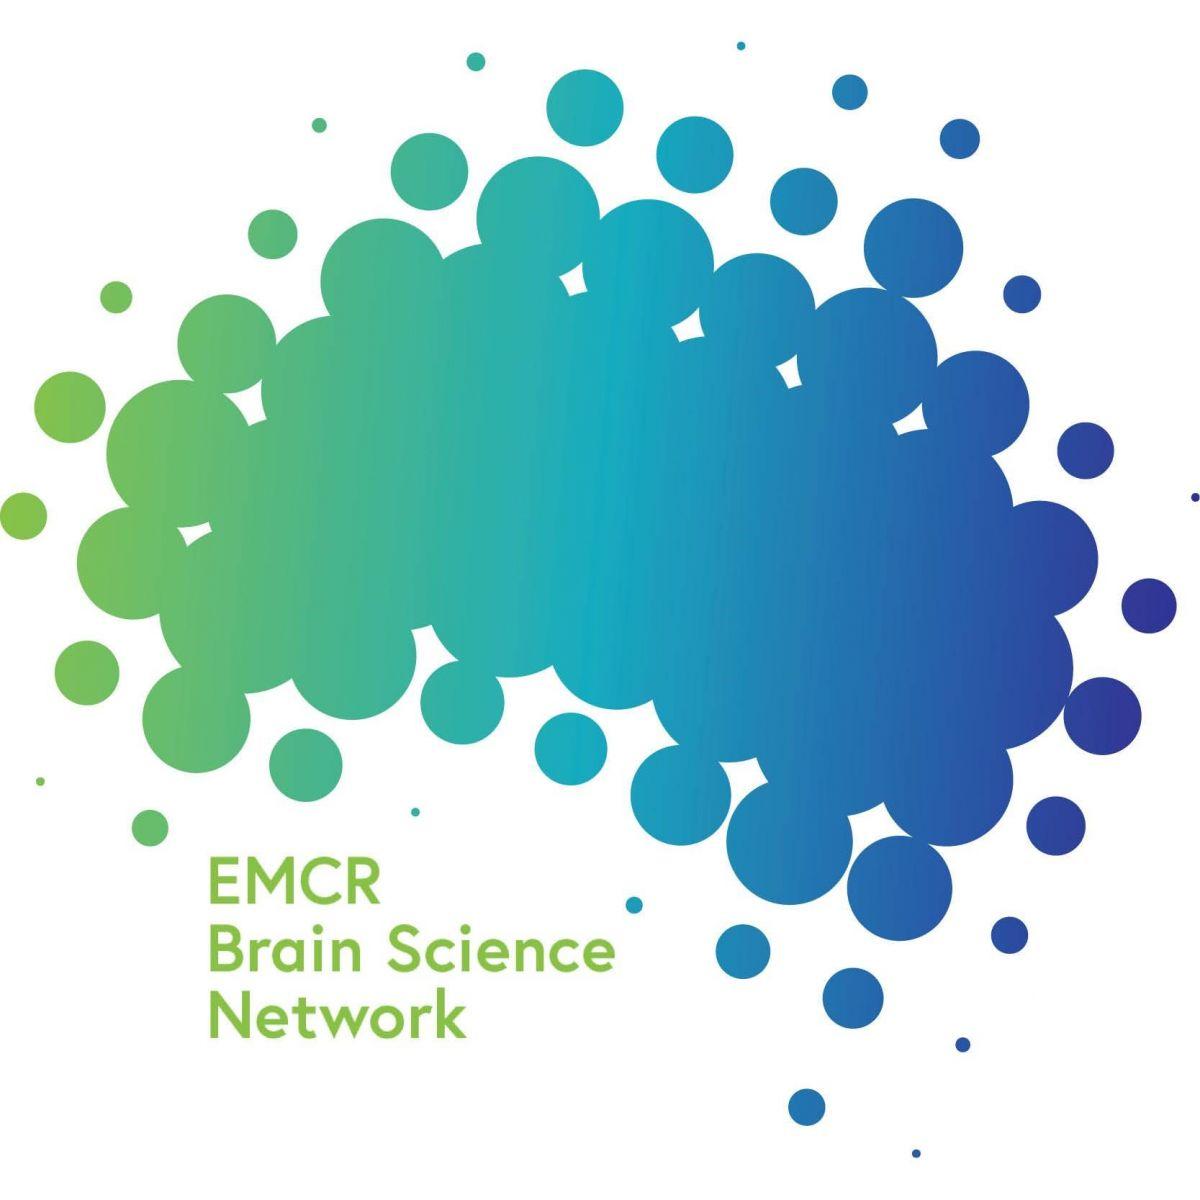 EMCR Brain Science Network Membership form | Australian Academy of